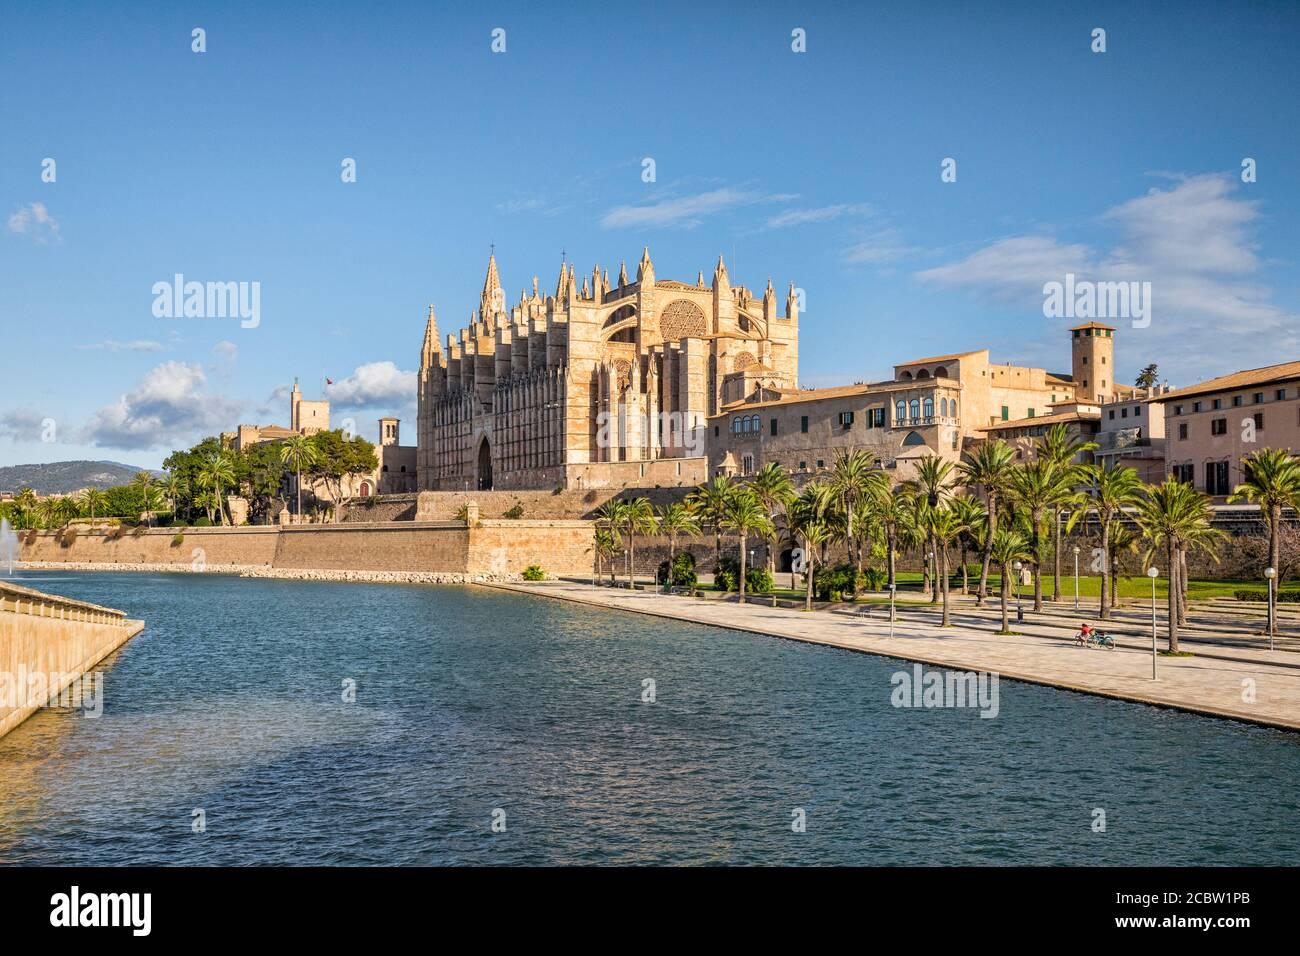 6. März 2020: Palma, Mallorca, Spanien - Parc de la Mar und Kathedrale von Mallorca. Stockfoto